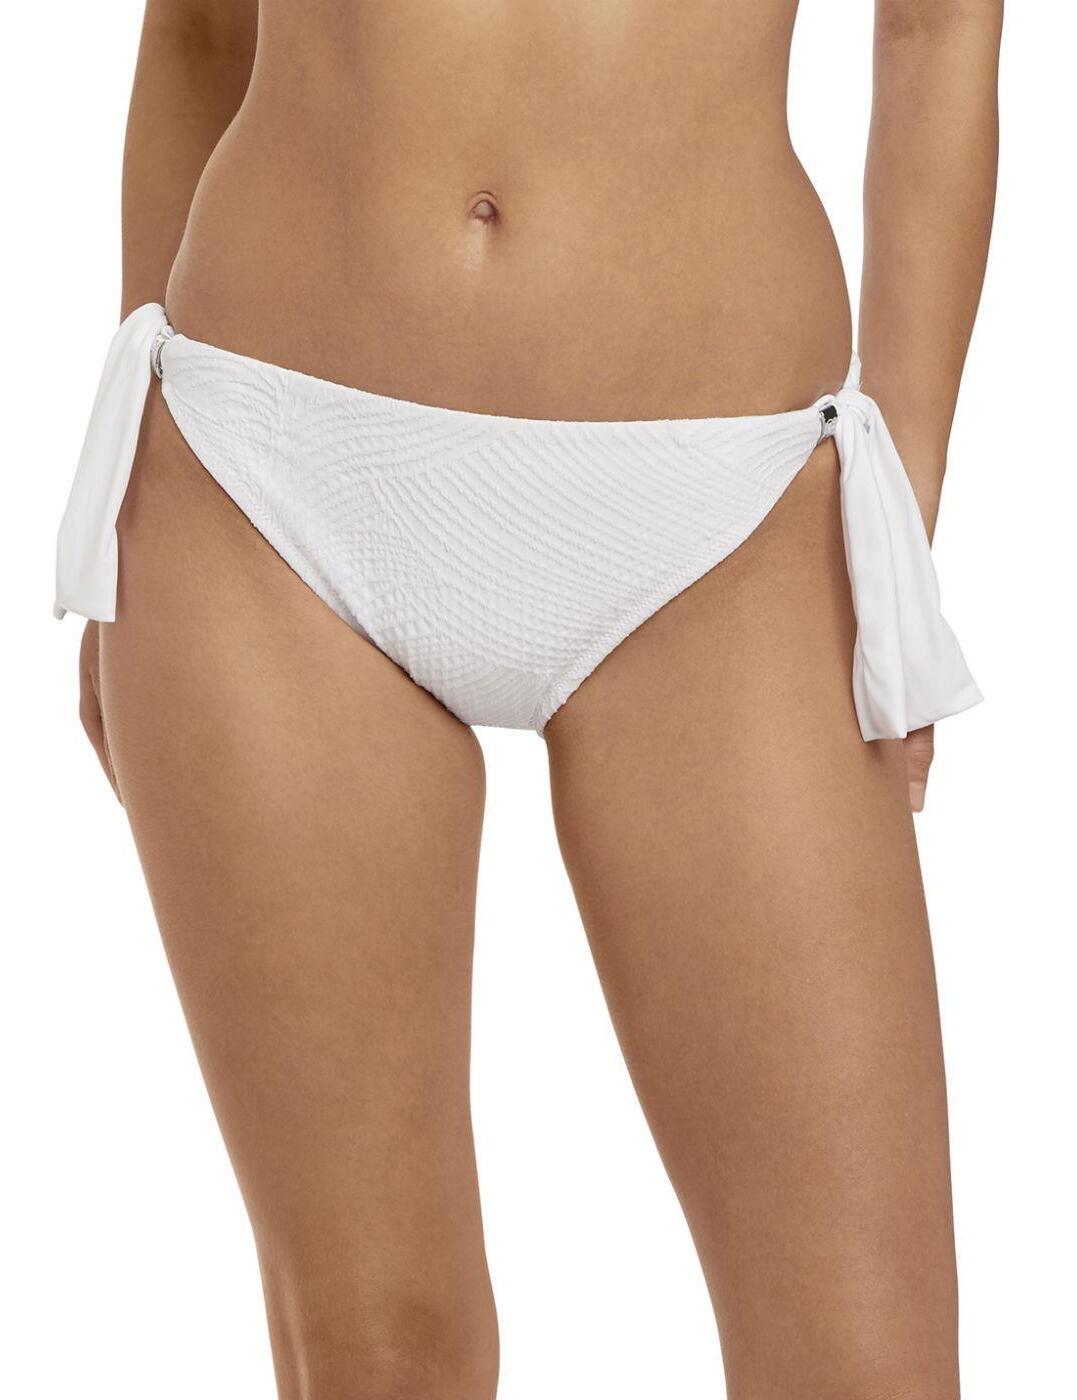 6357 Fantasie Ottawa Classic Scarf Tie Bikini Brief - 6357 White